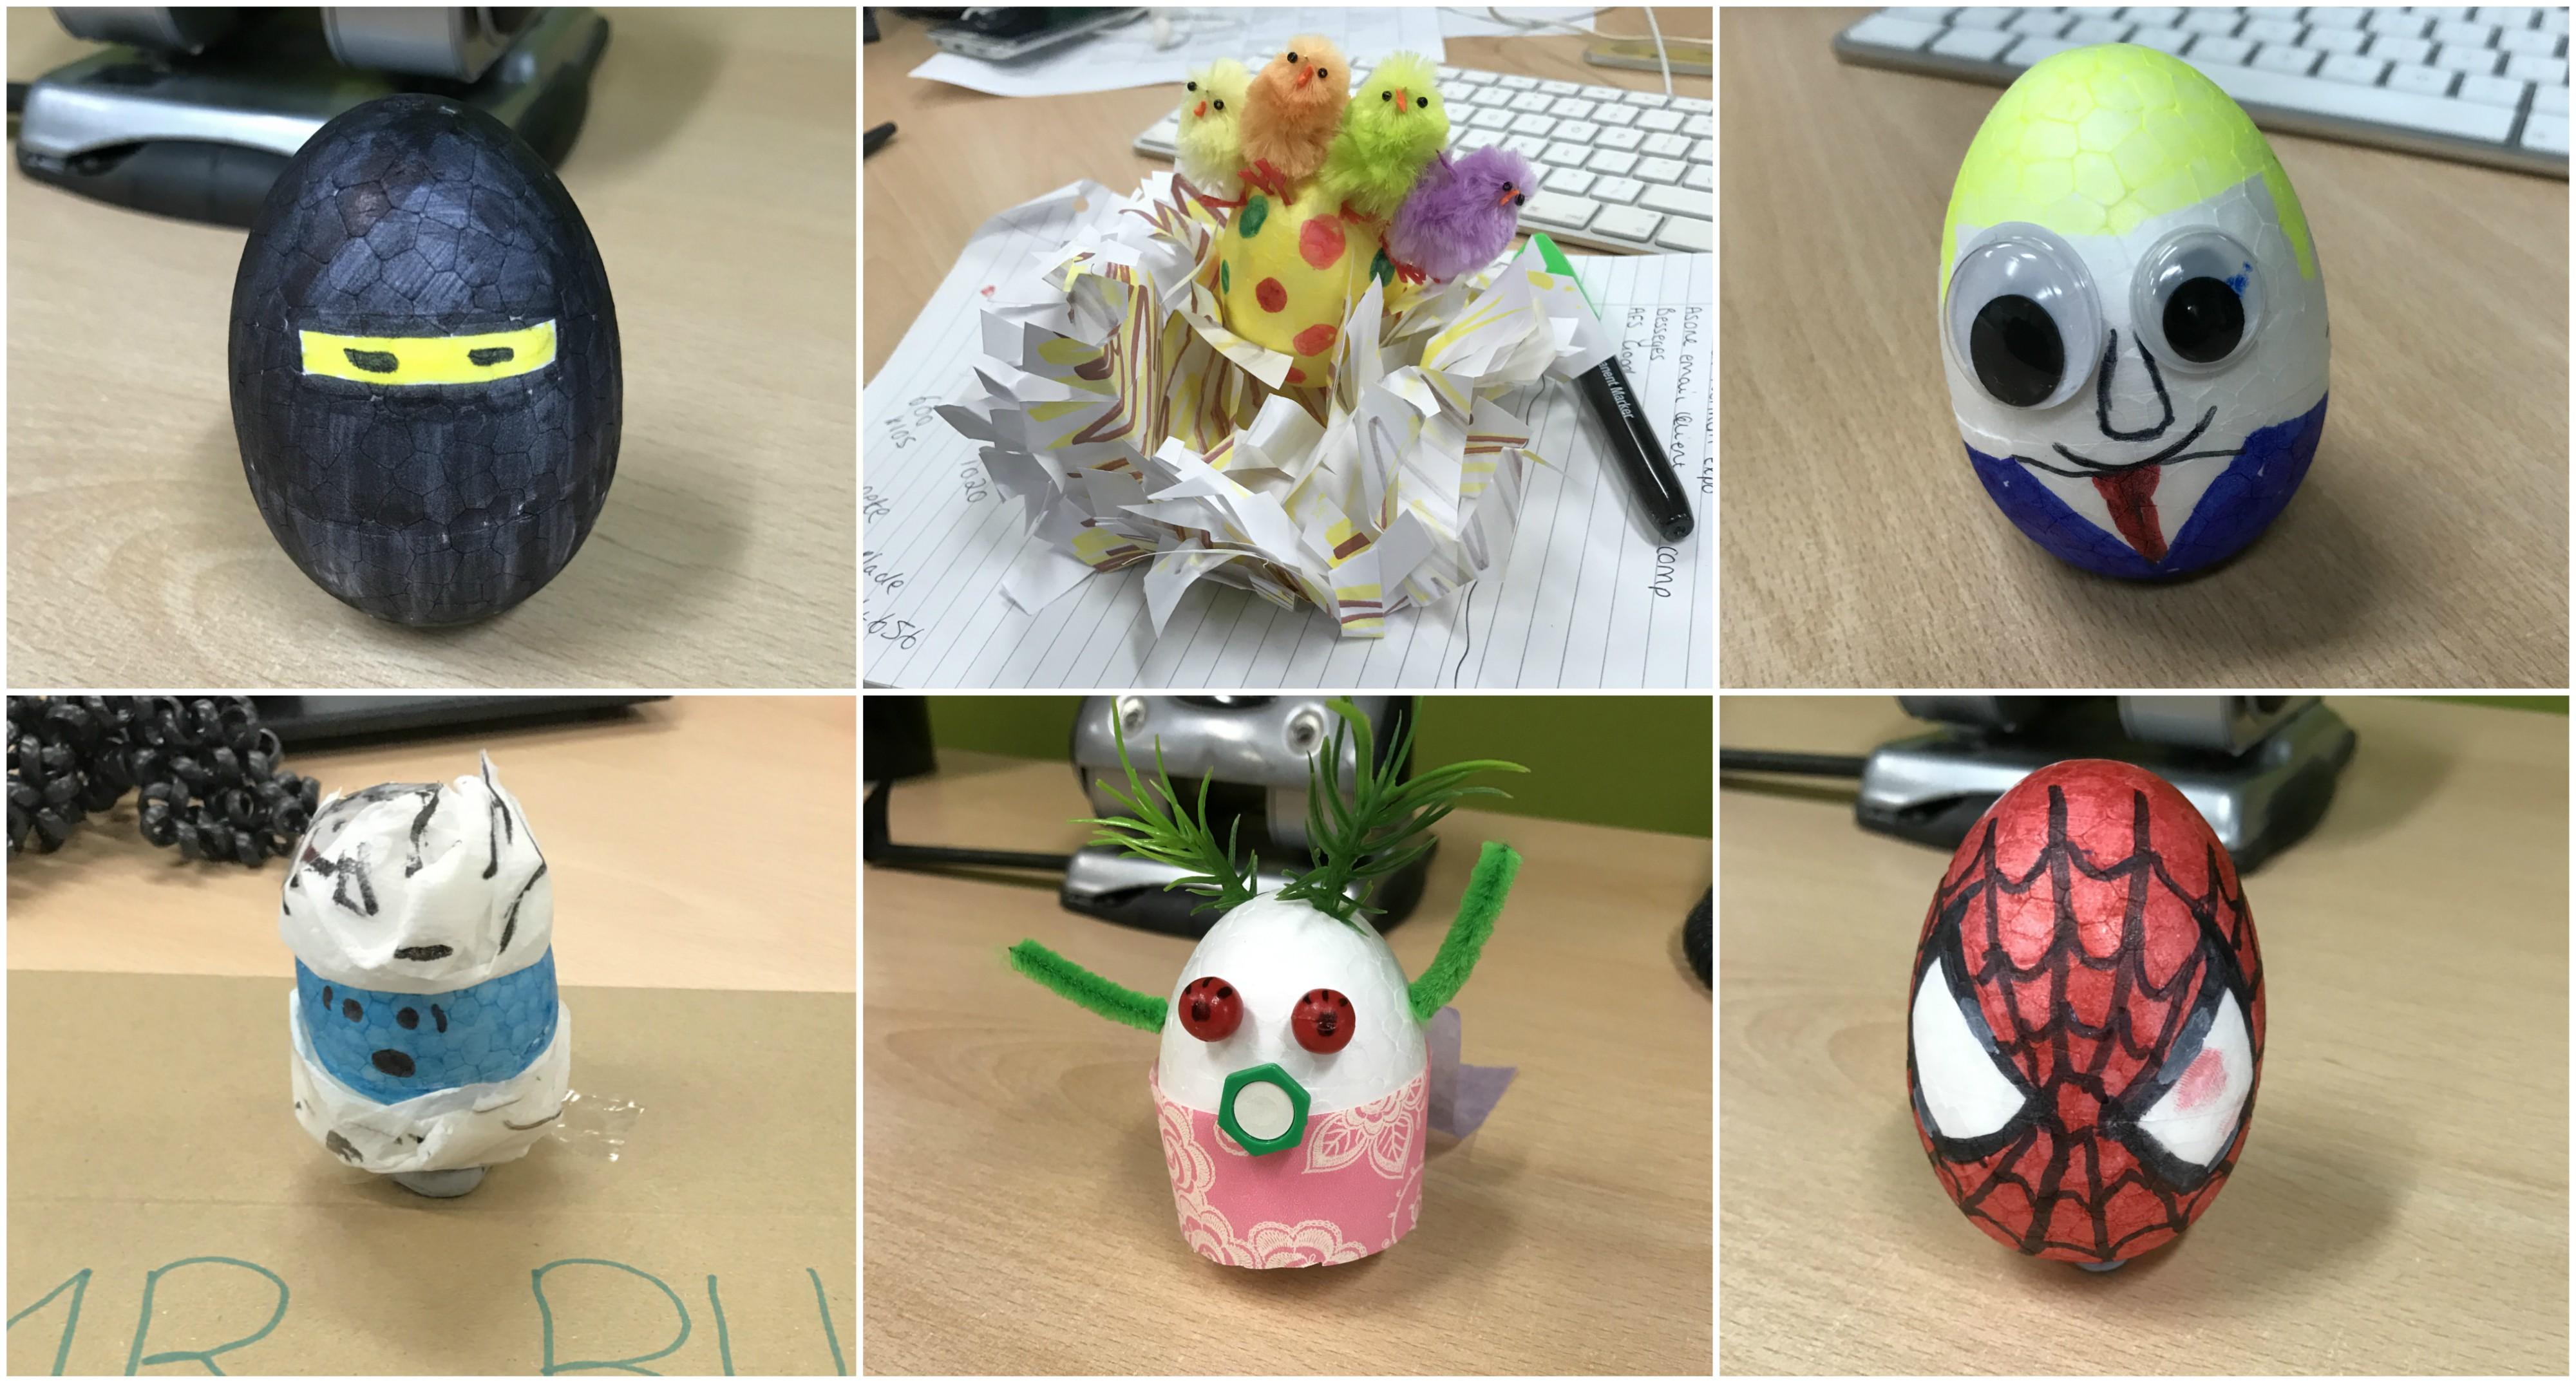 fun office activities asone creative digital marketing